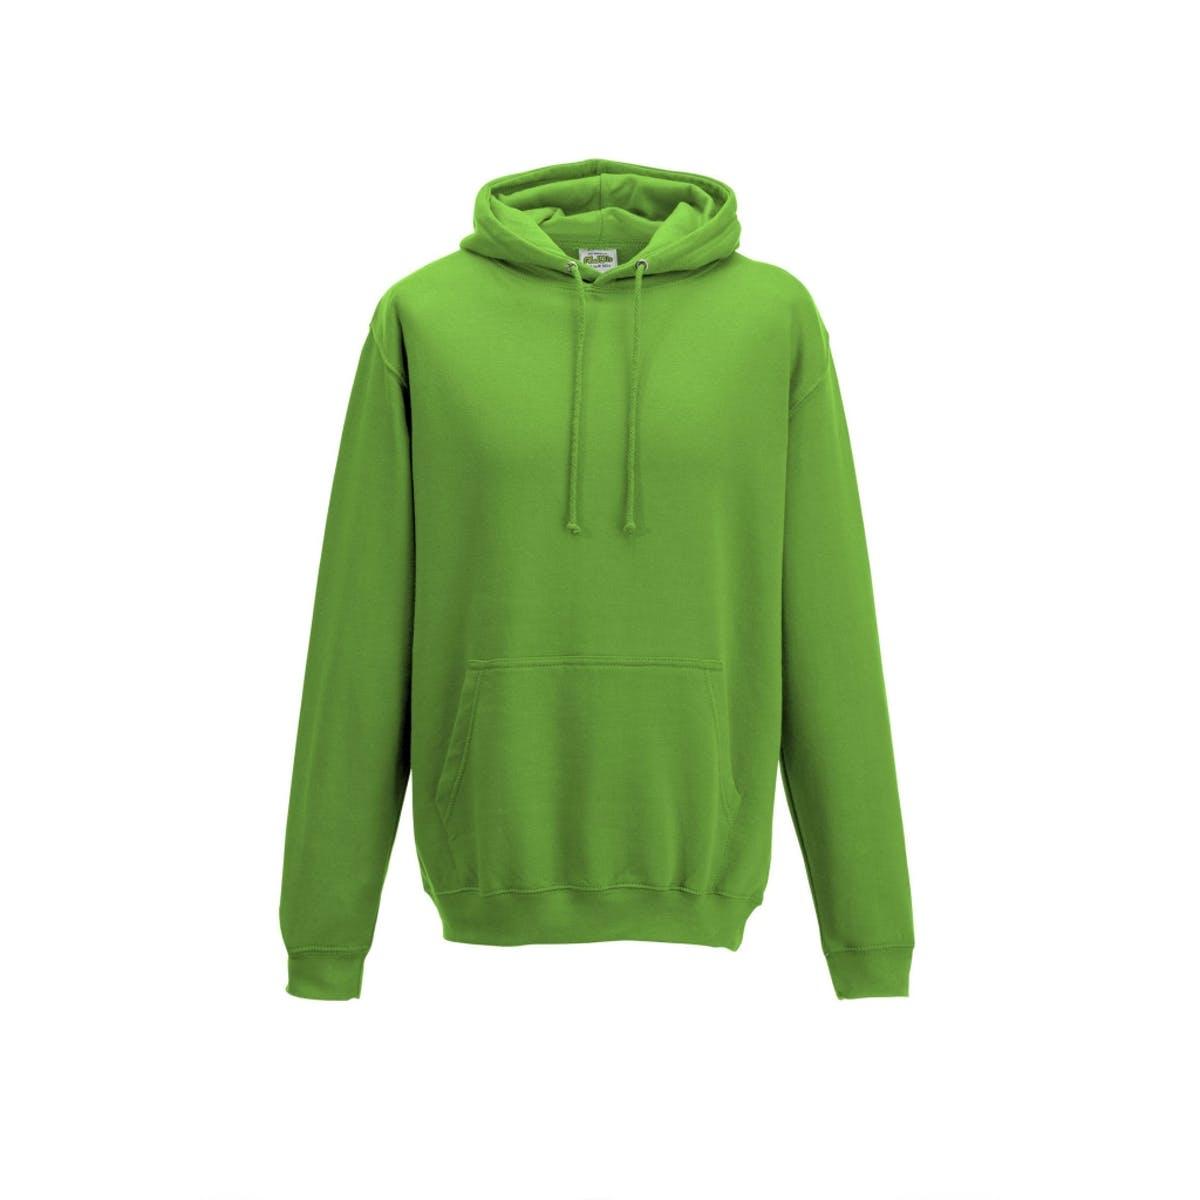 lime green college hoodies